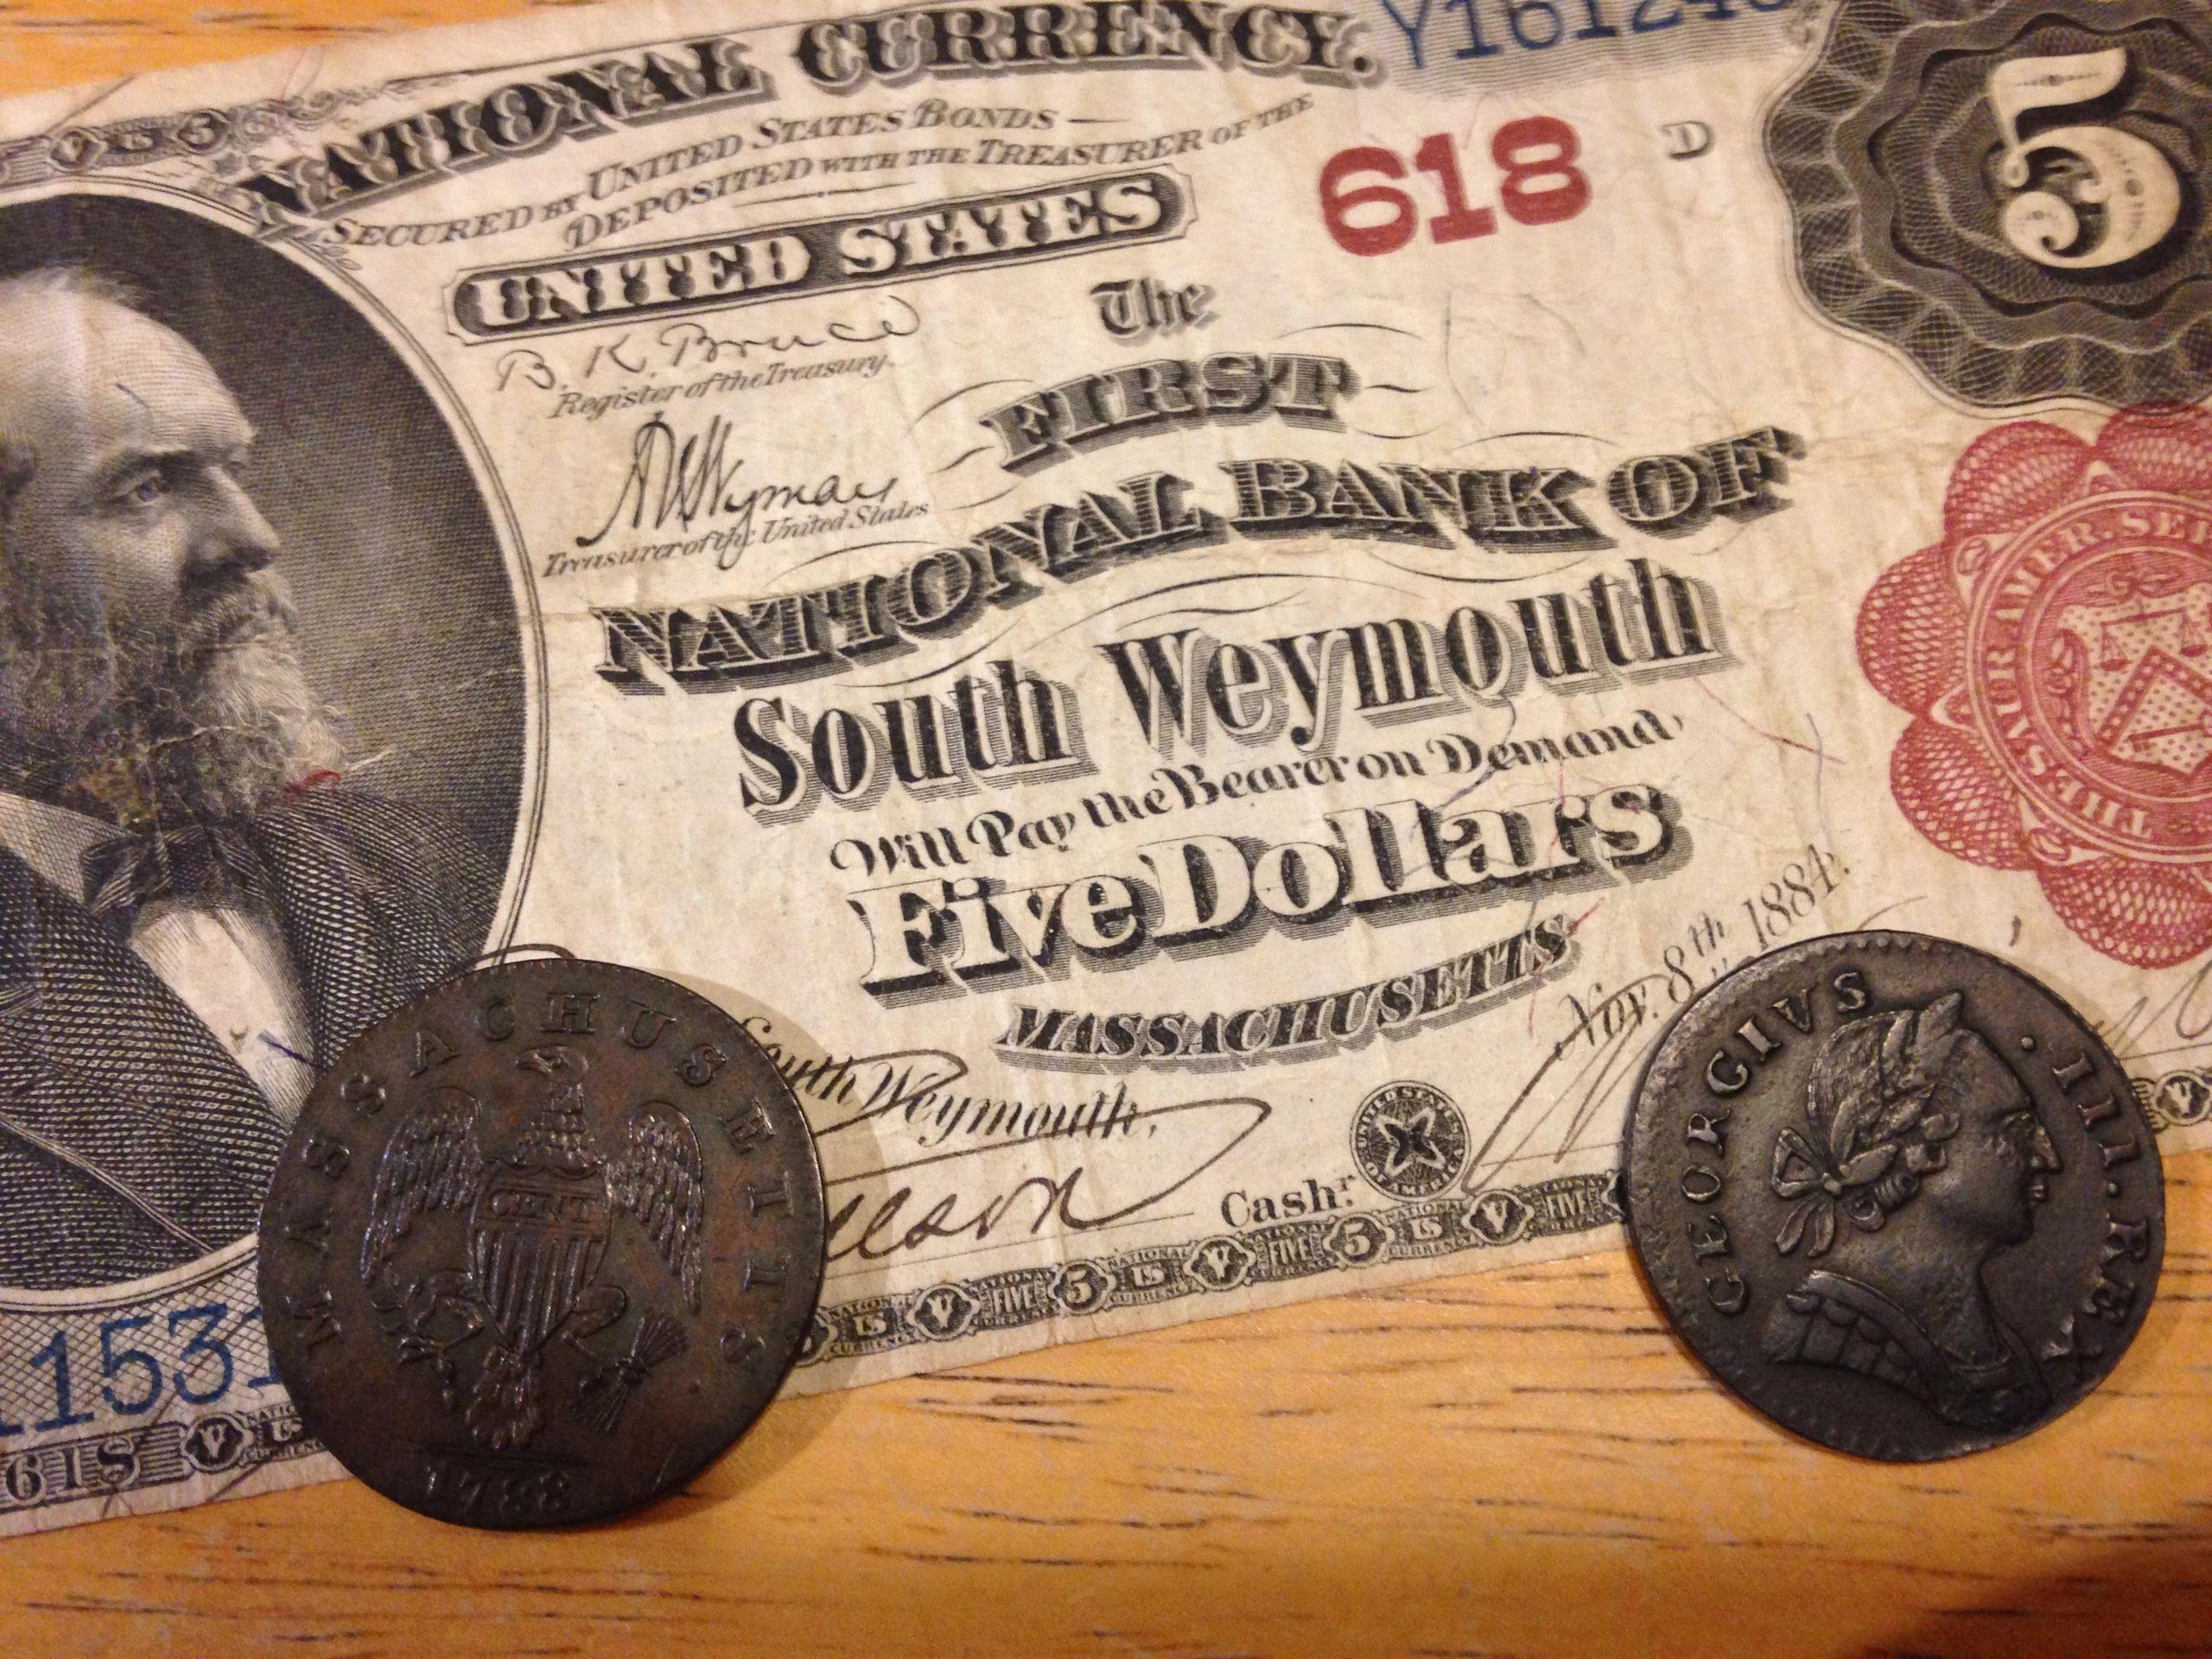 Pilgrim Coin & Currency, LLC